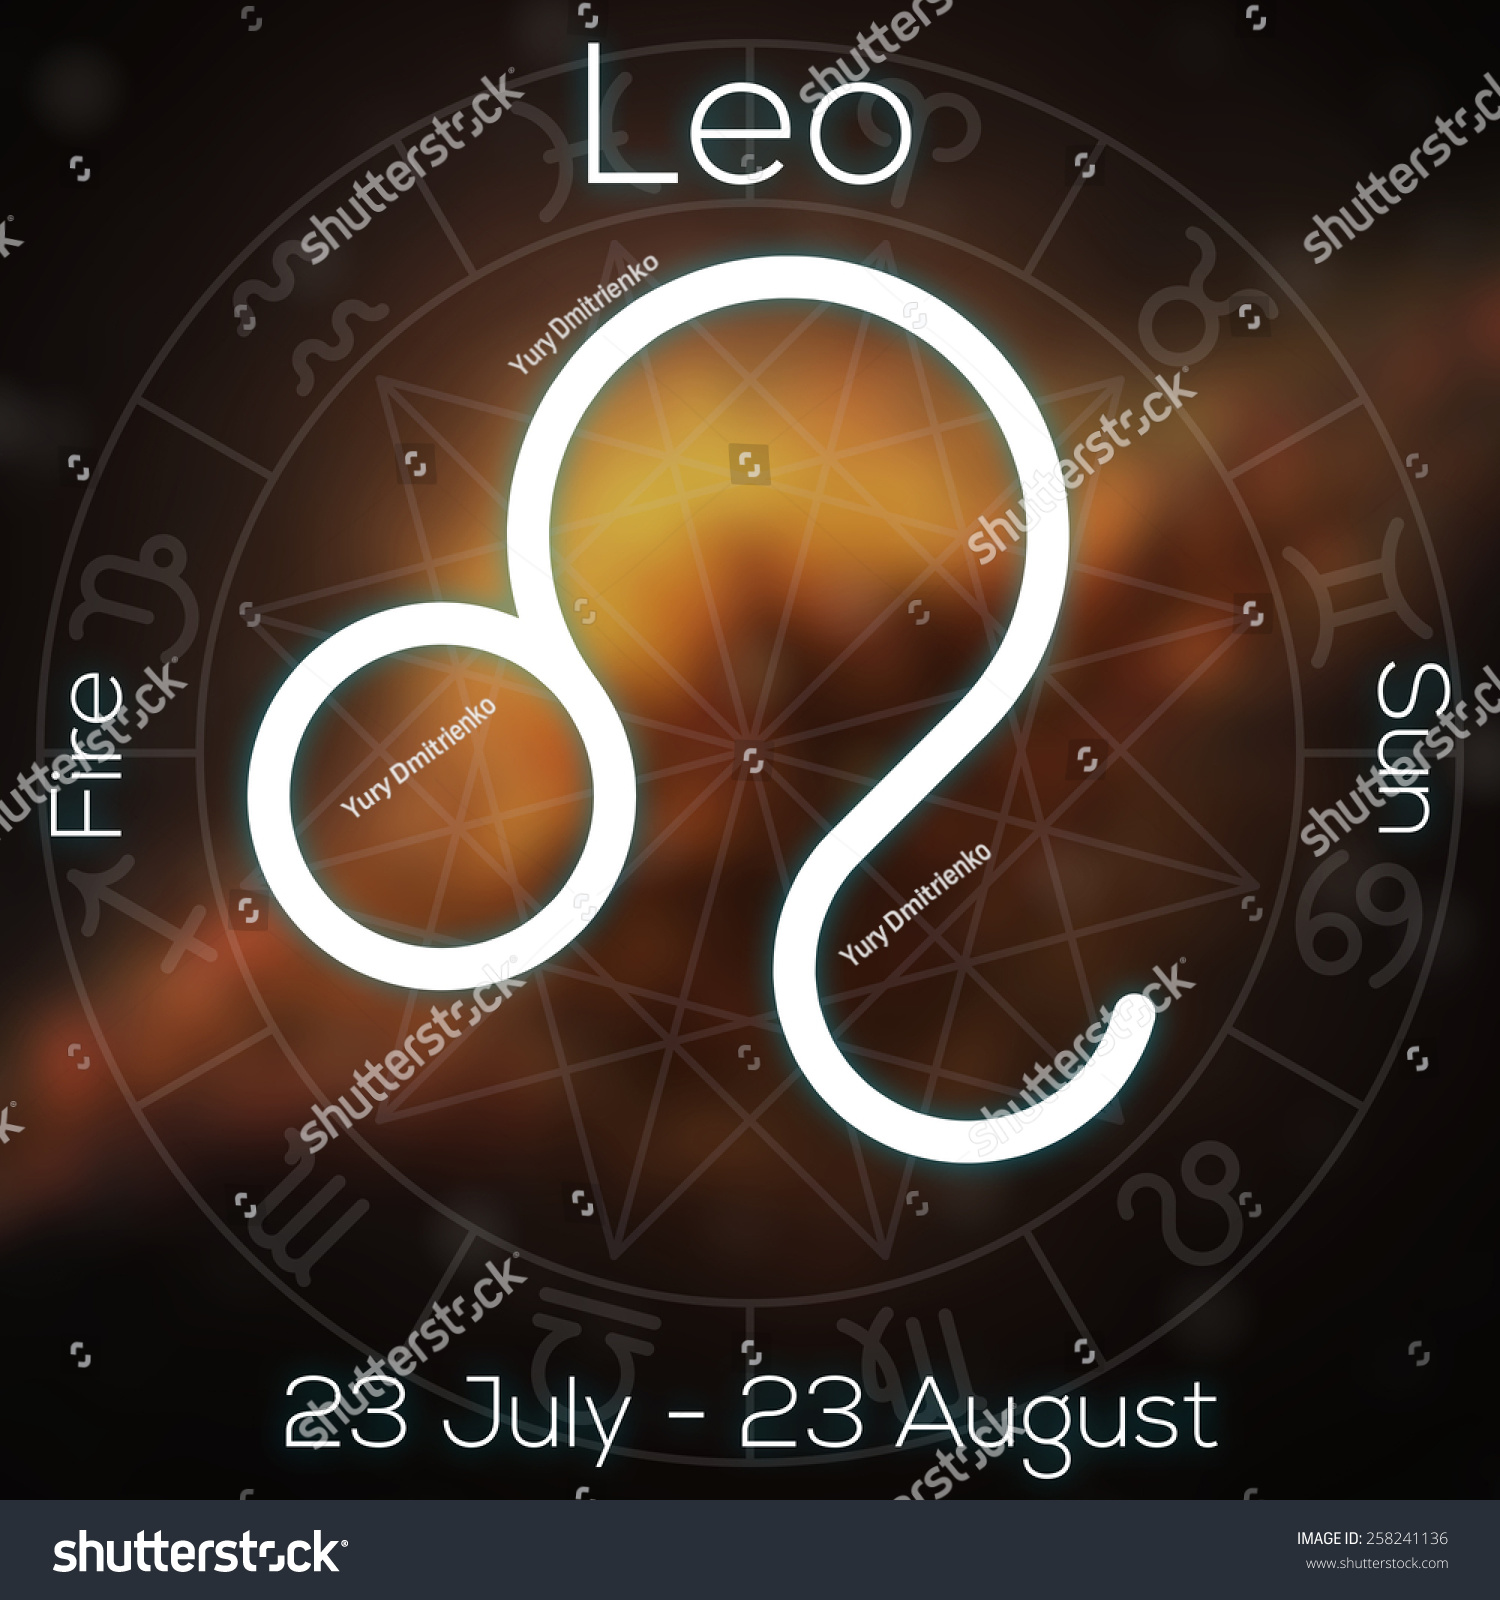 Leo sign dates in Sydney